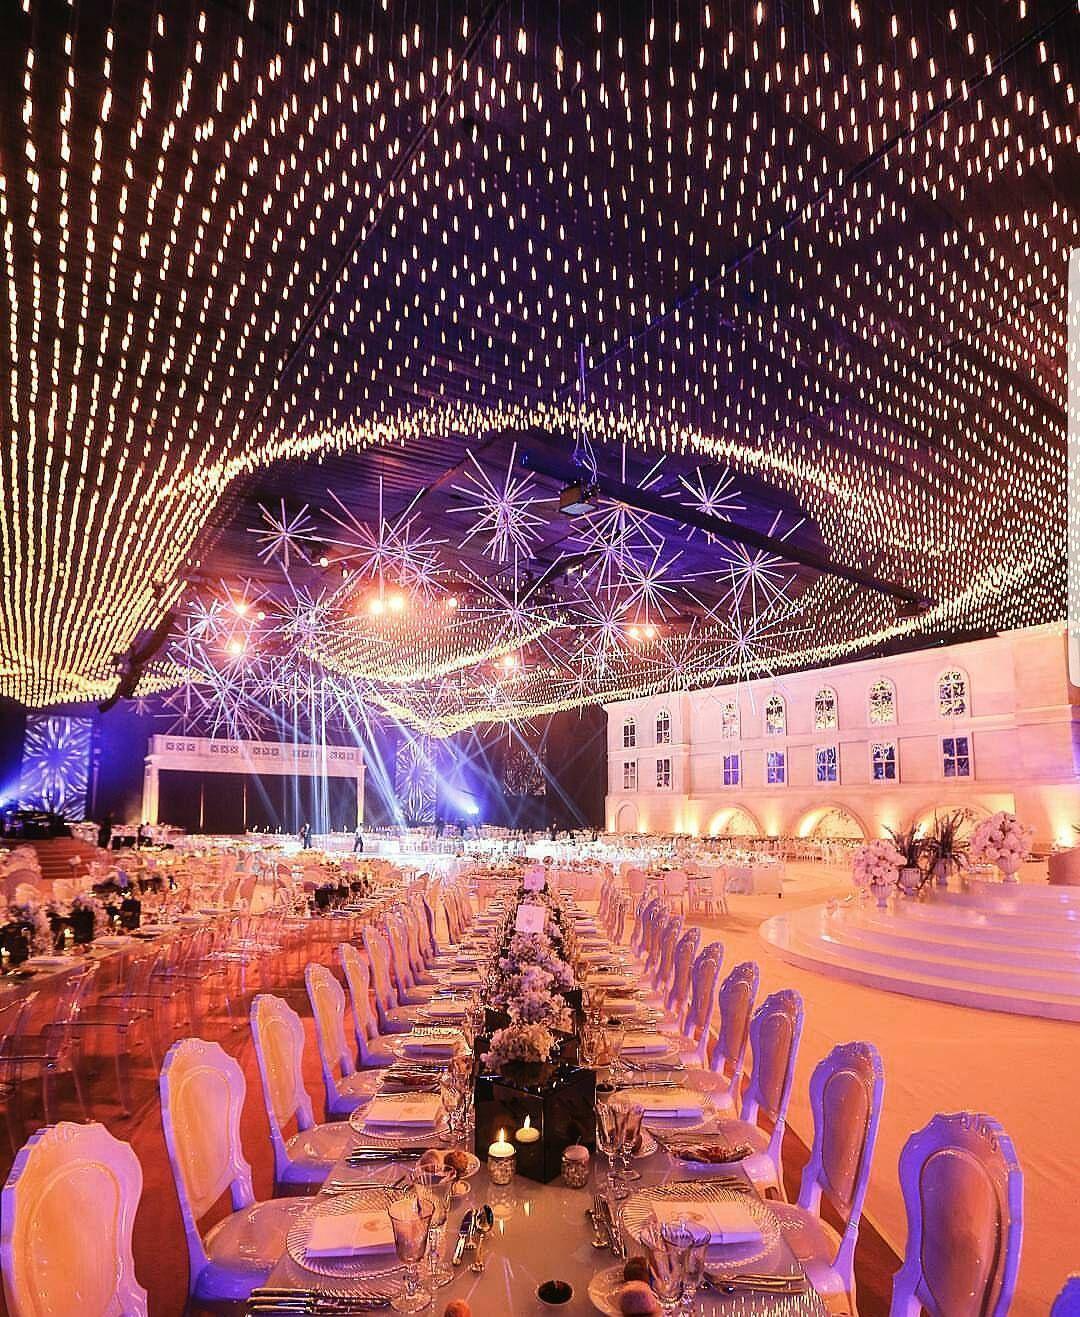 Wedding venue decoration images  A grandeur modern wedding by bypaulnasr lebaneseweddings